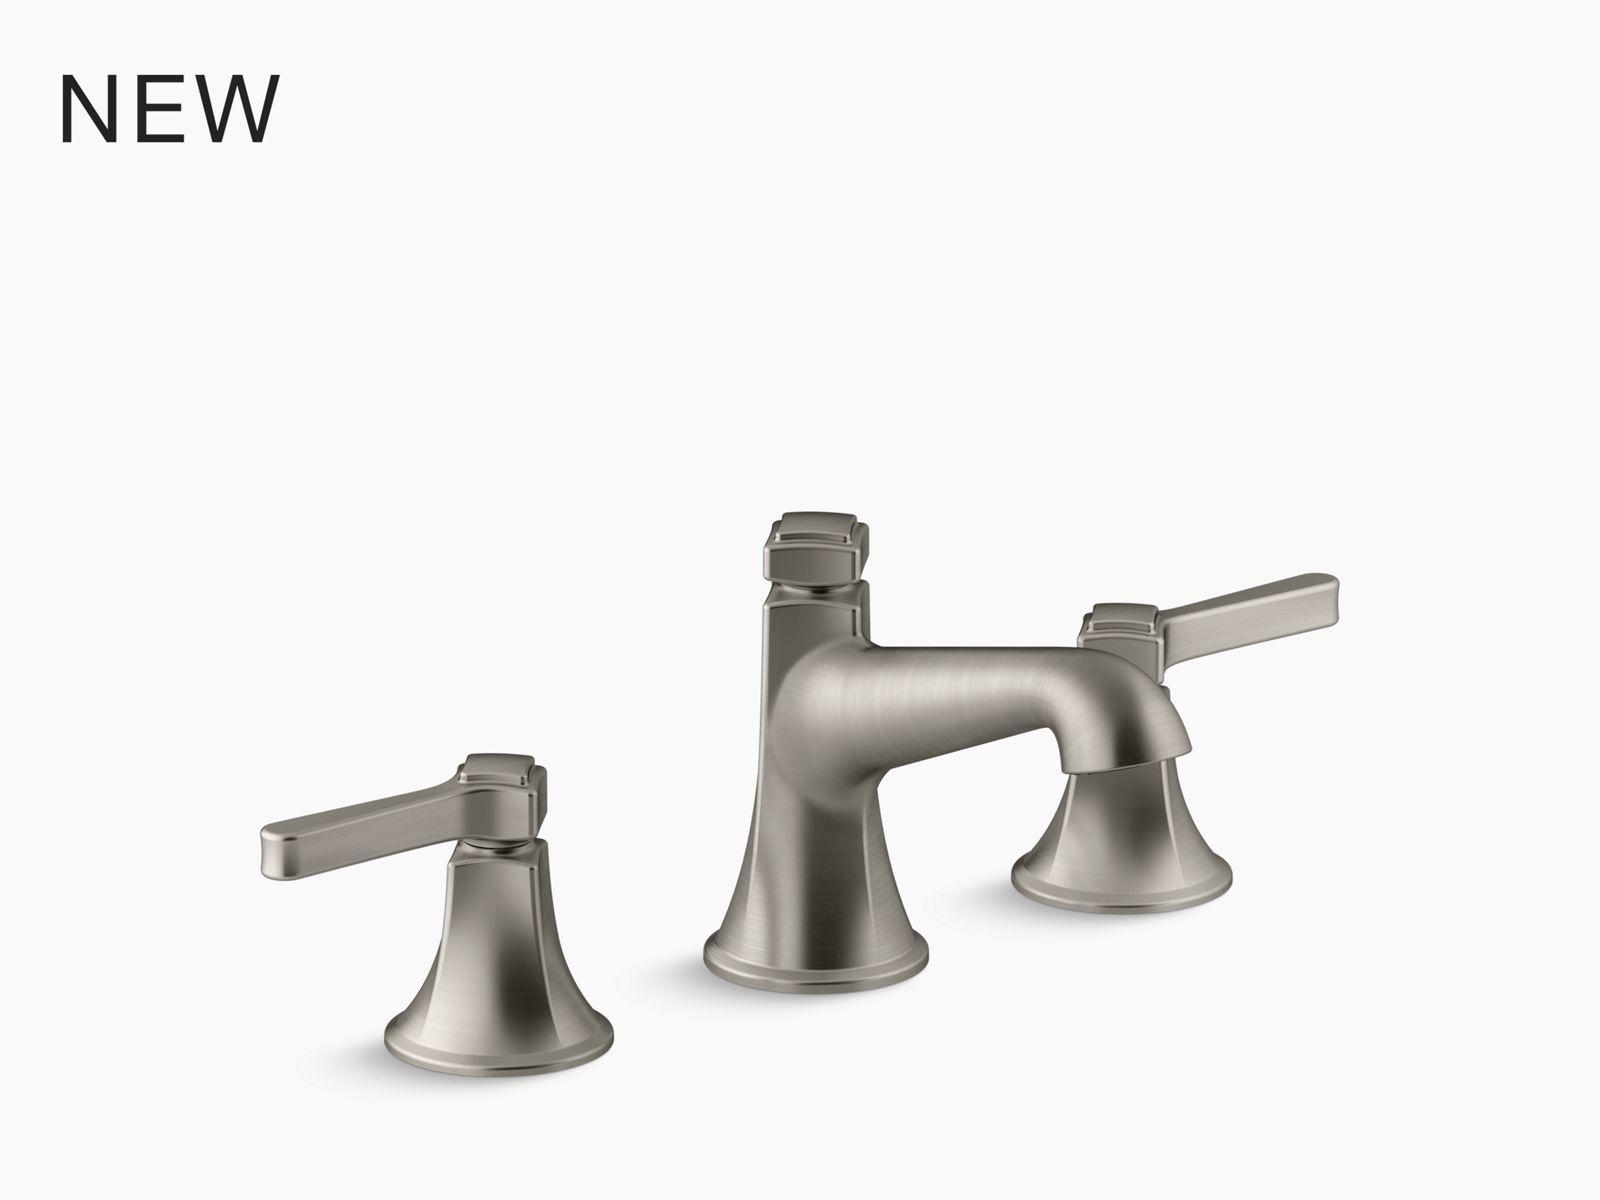 forte sculpted sculpted deck mount bath faucet trim for high flow valve with diverter spout valve not included